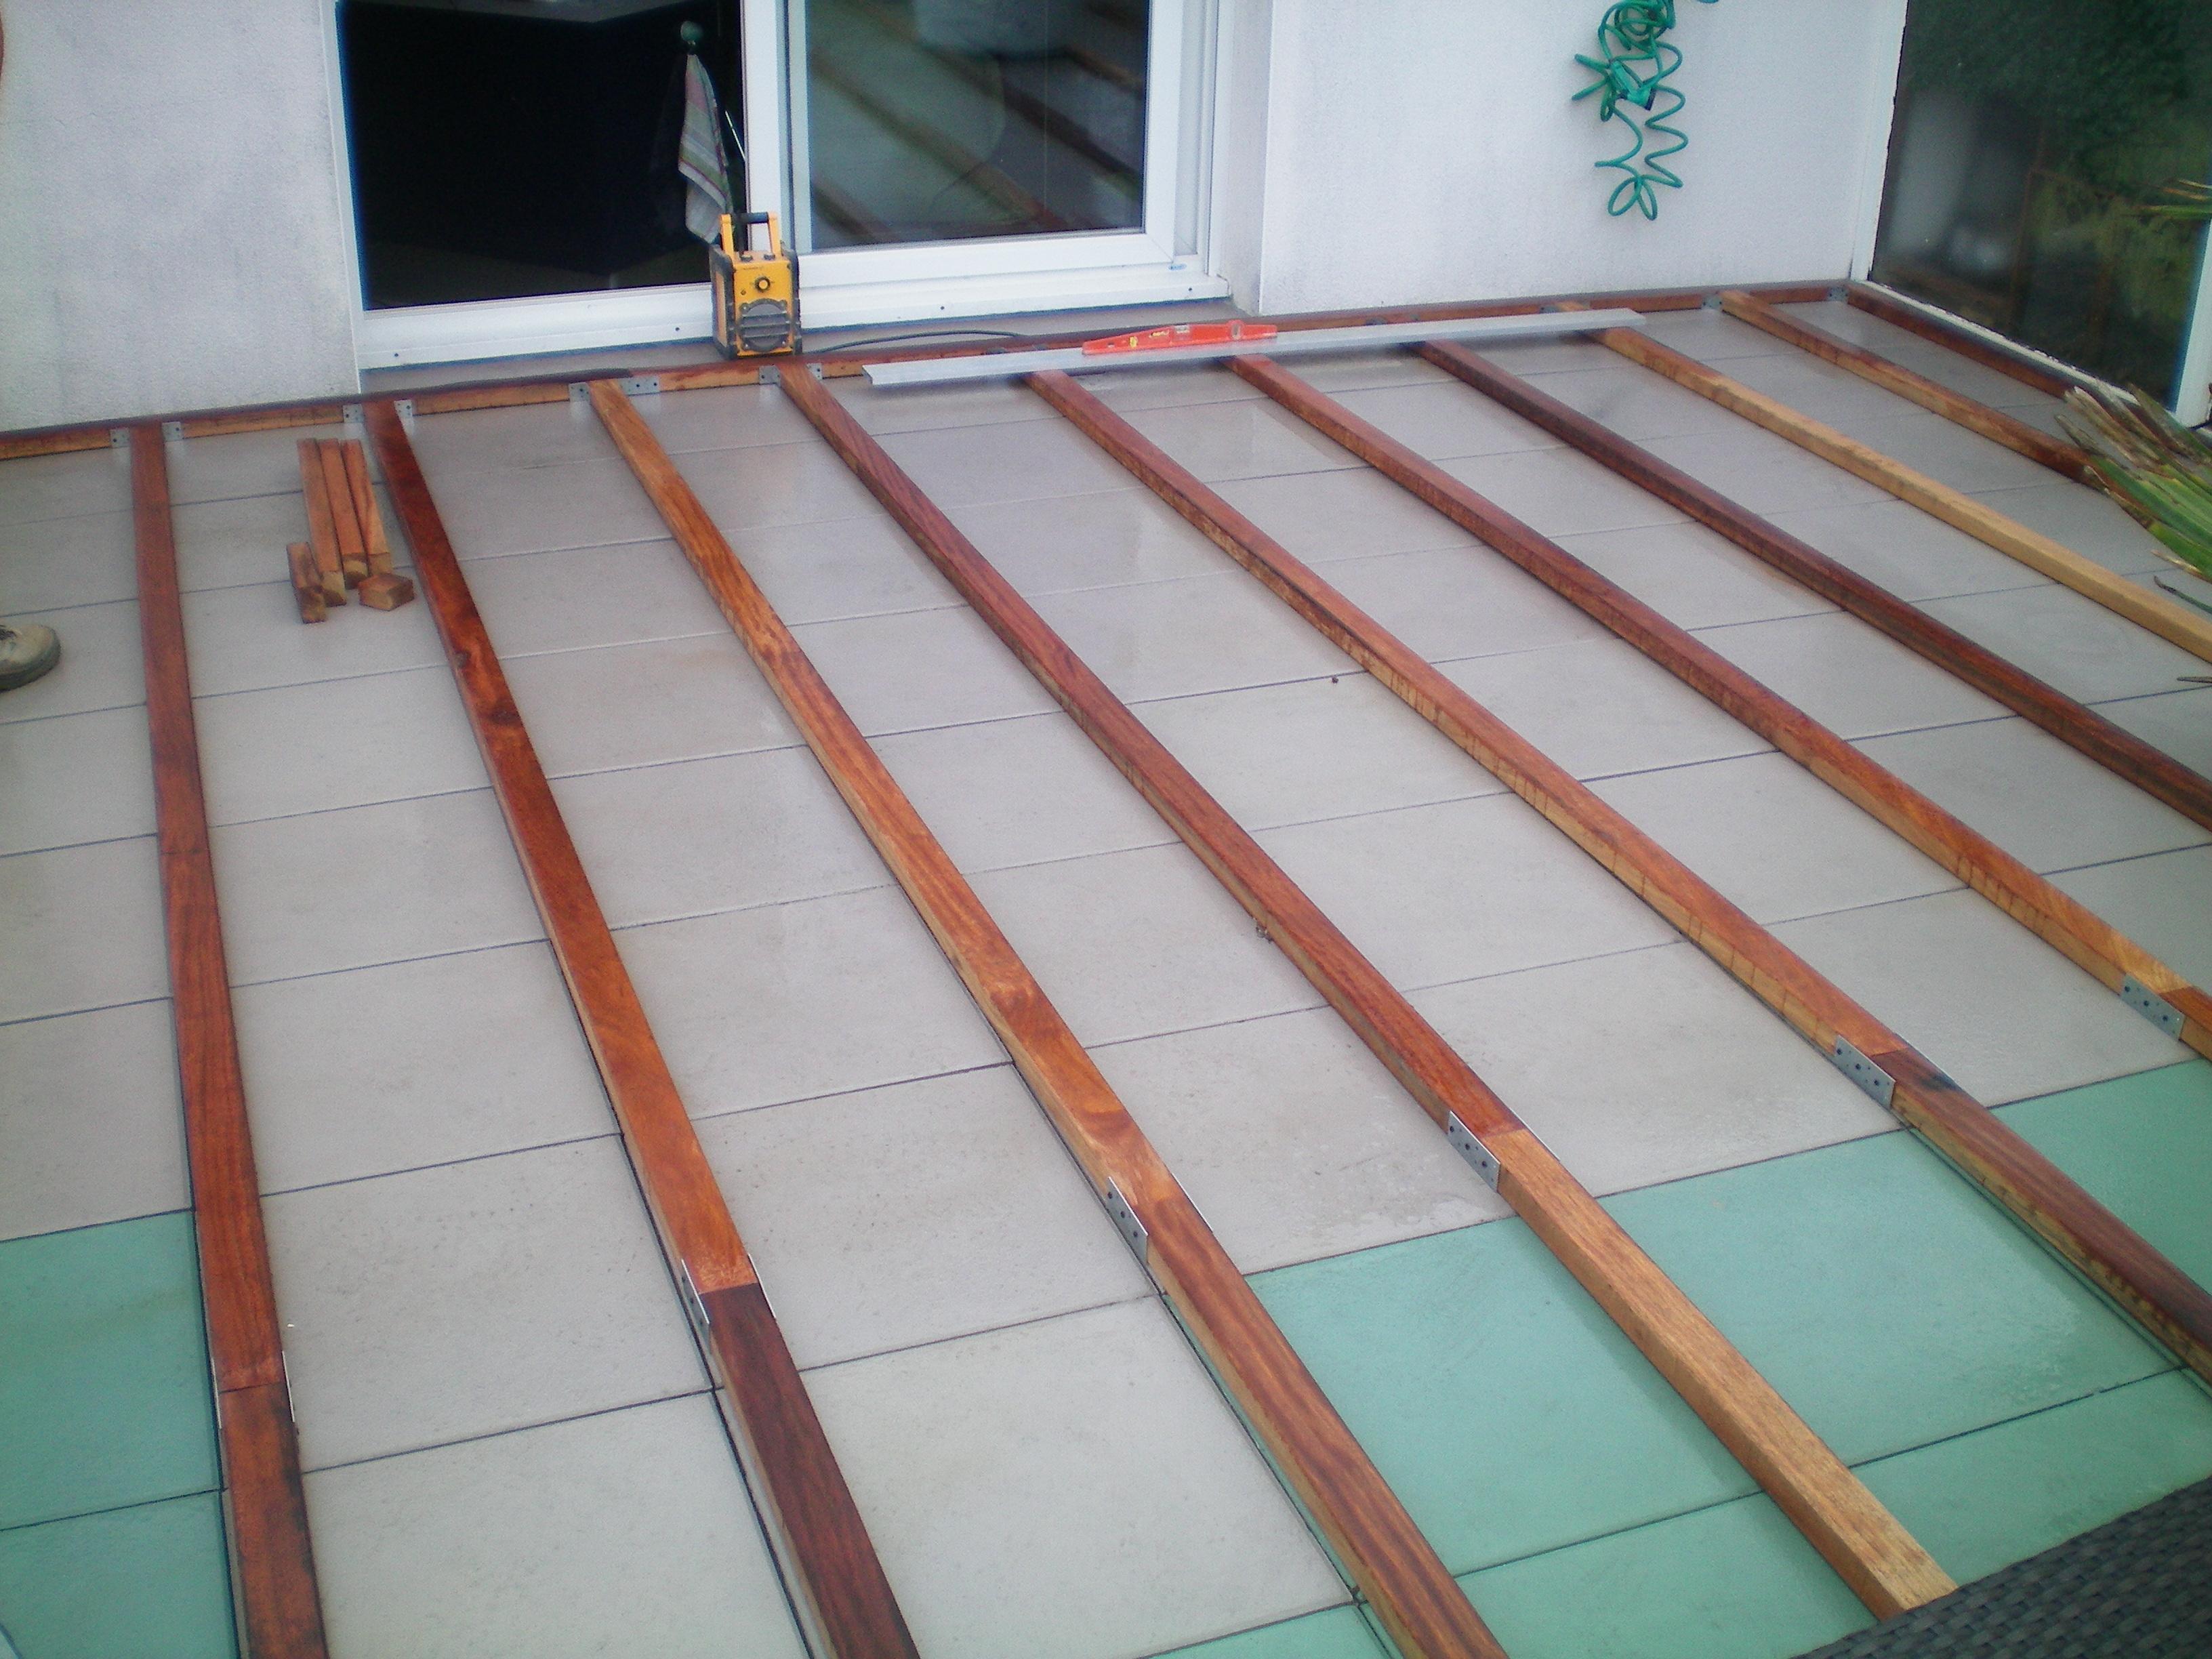 Attirant Installer Une Terrasse En Composite Sur Dalle Beton Veranda